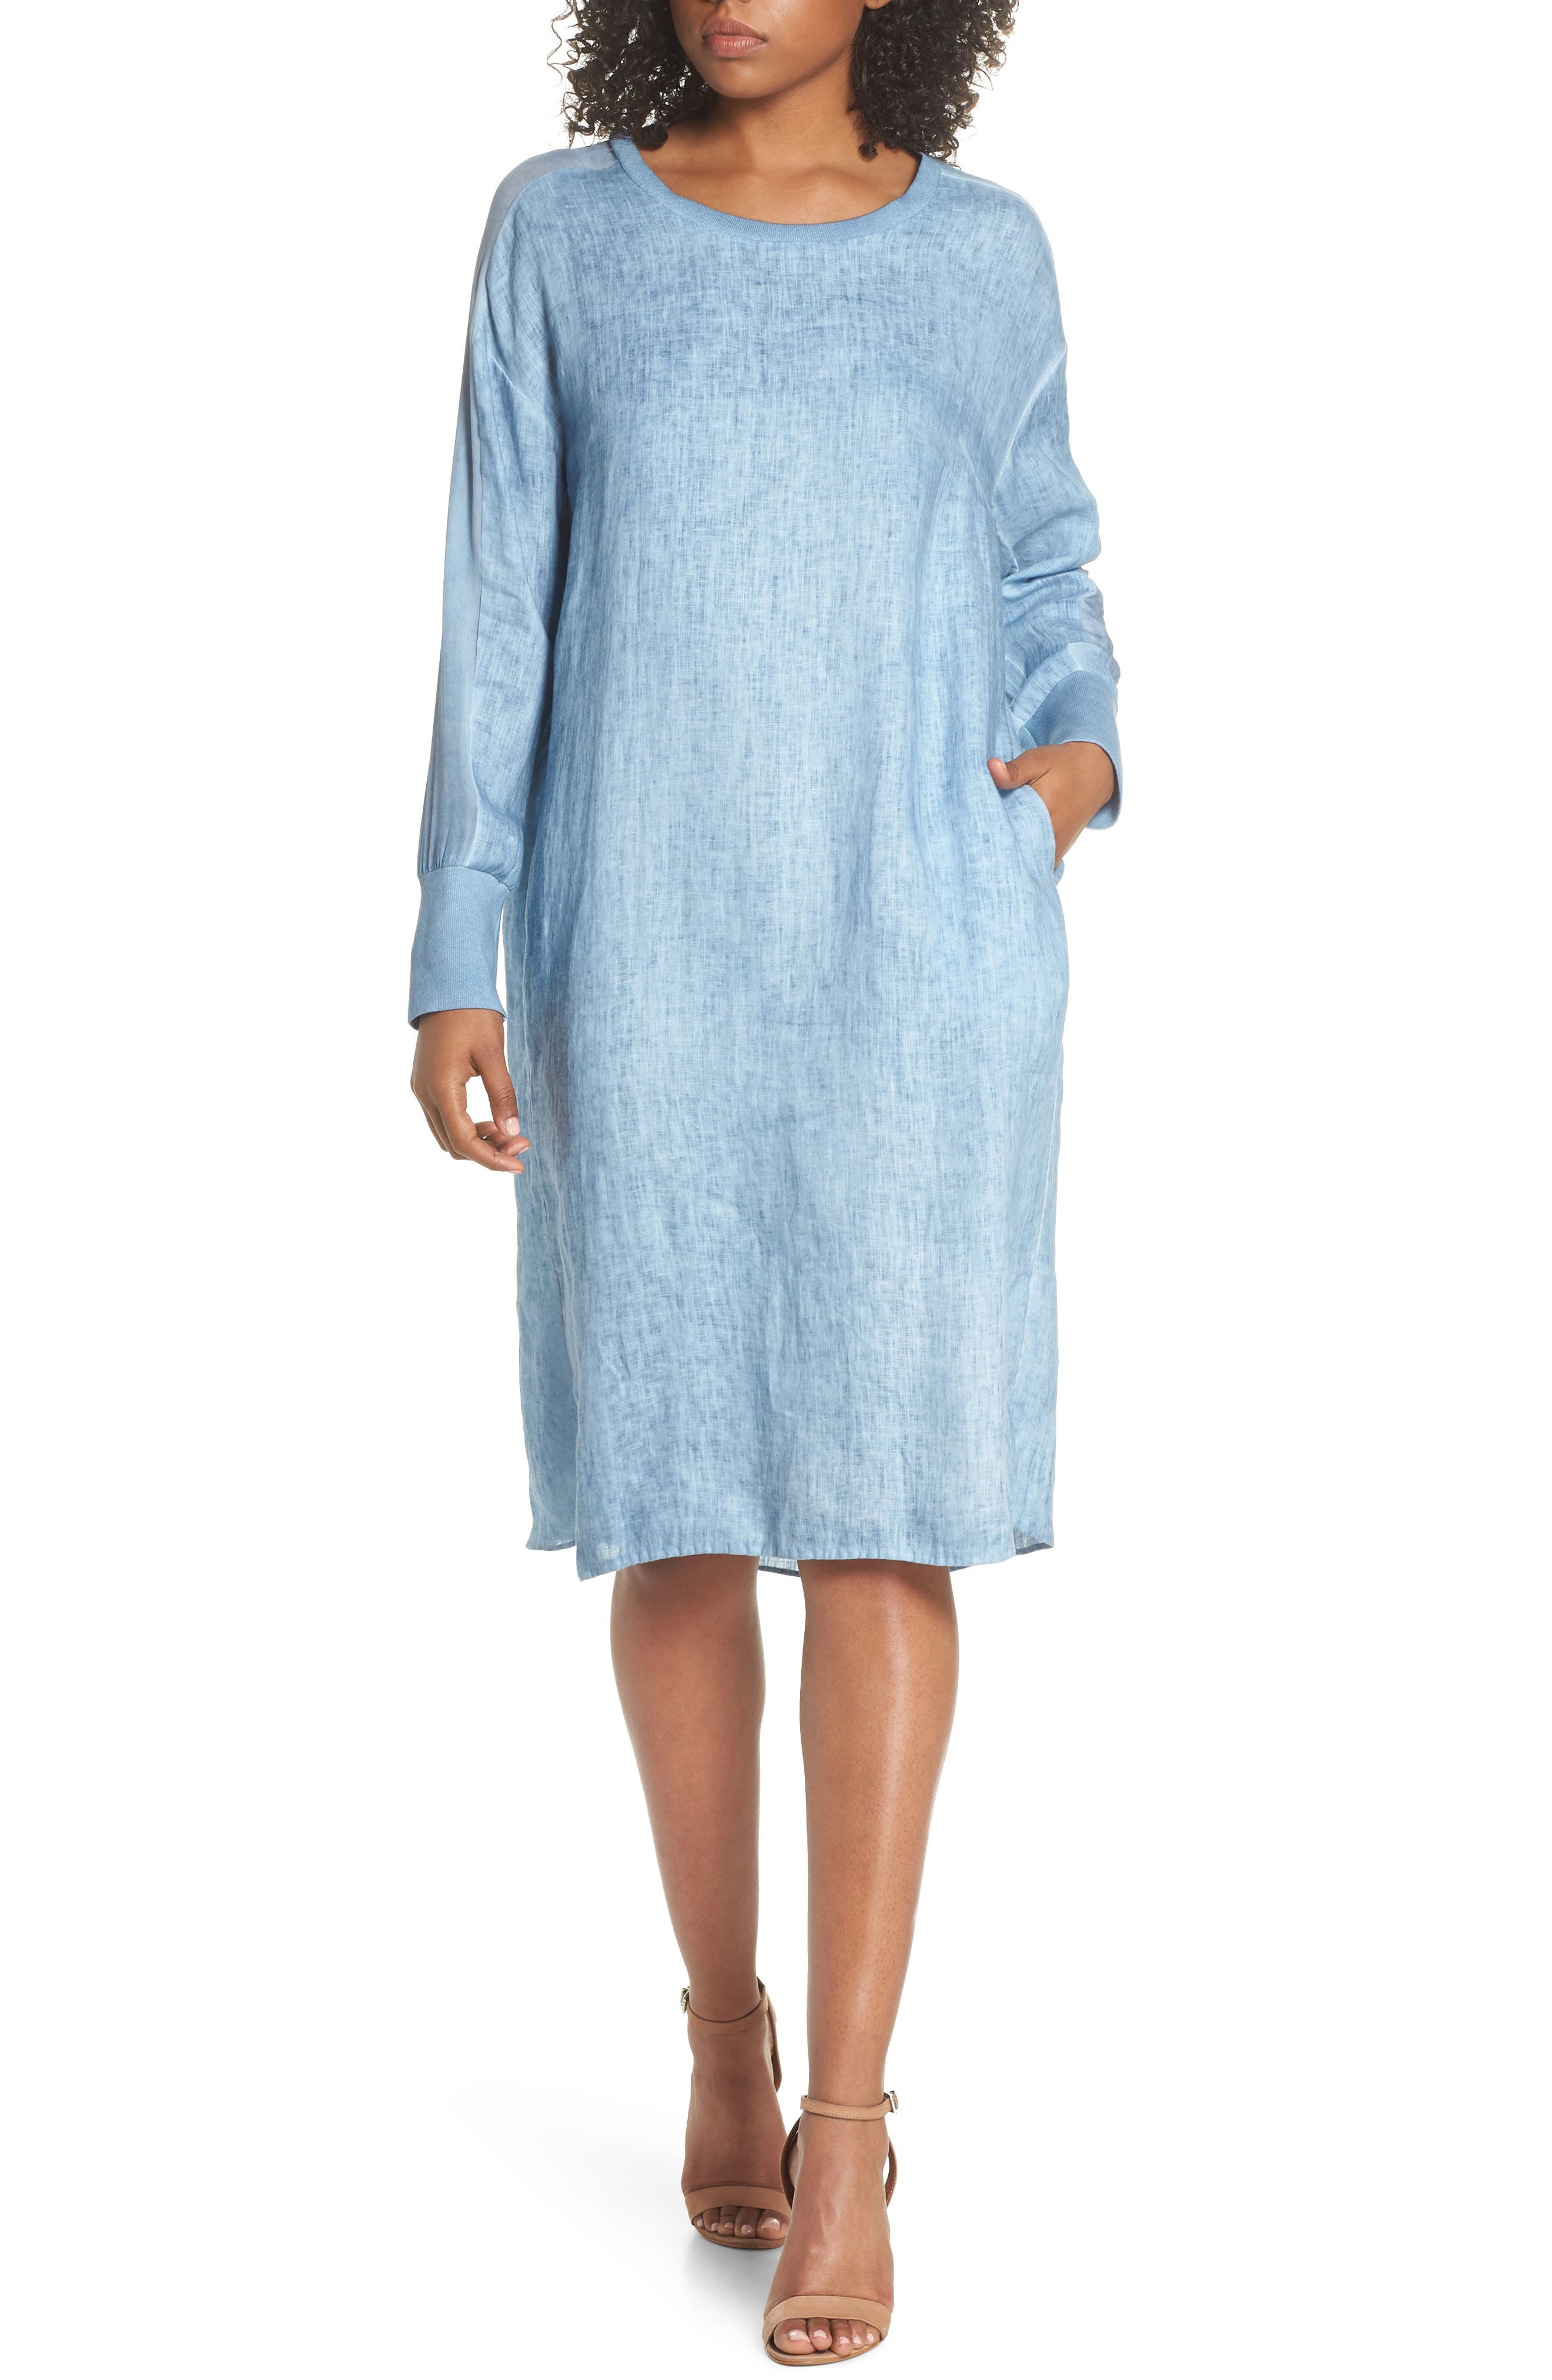 Rata Linen Shift Dress,                             Alternate thumbnail 6, color,                             400